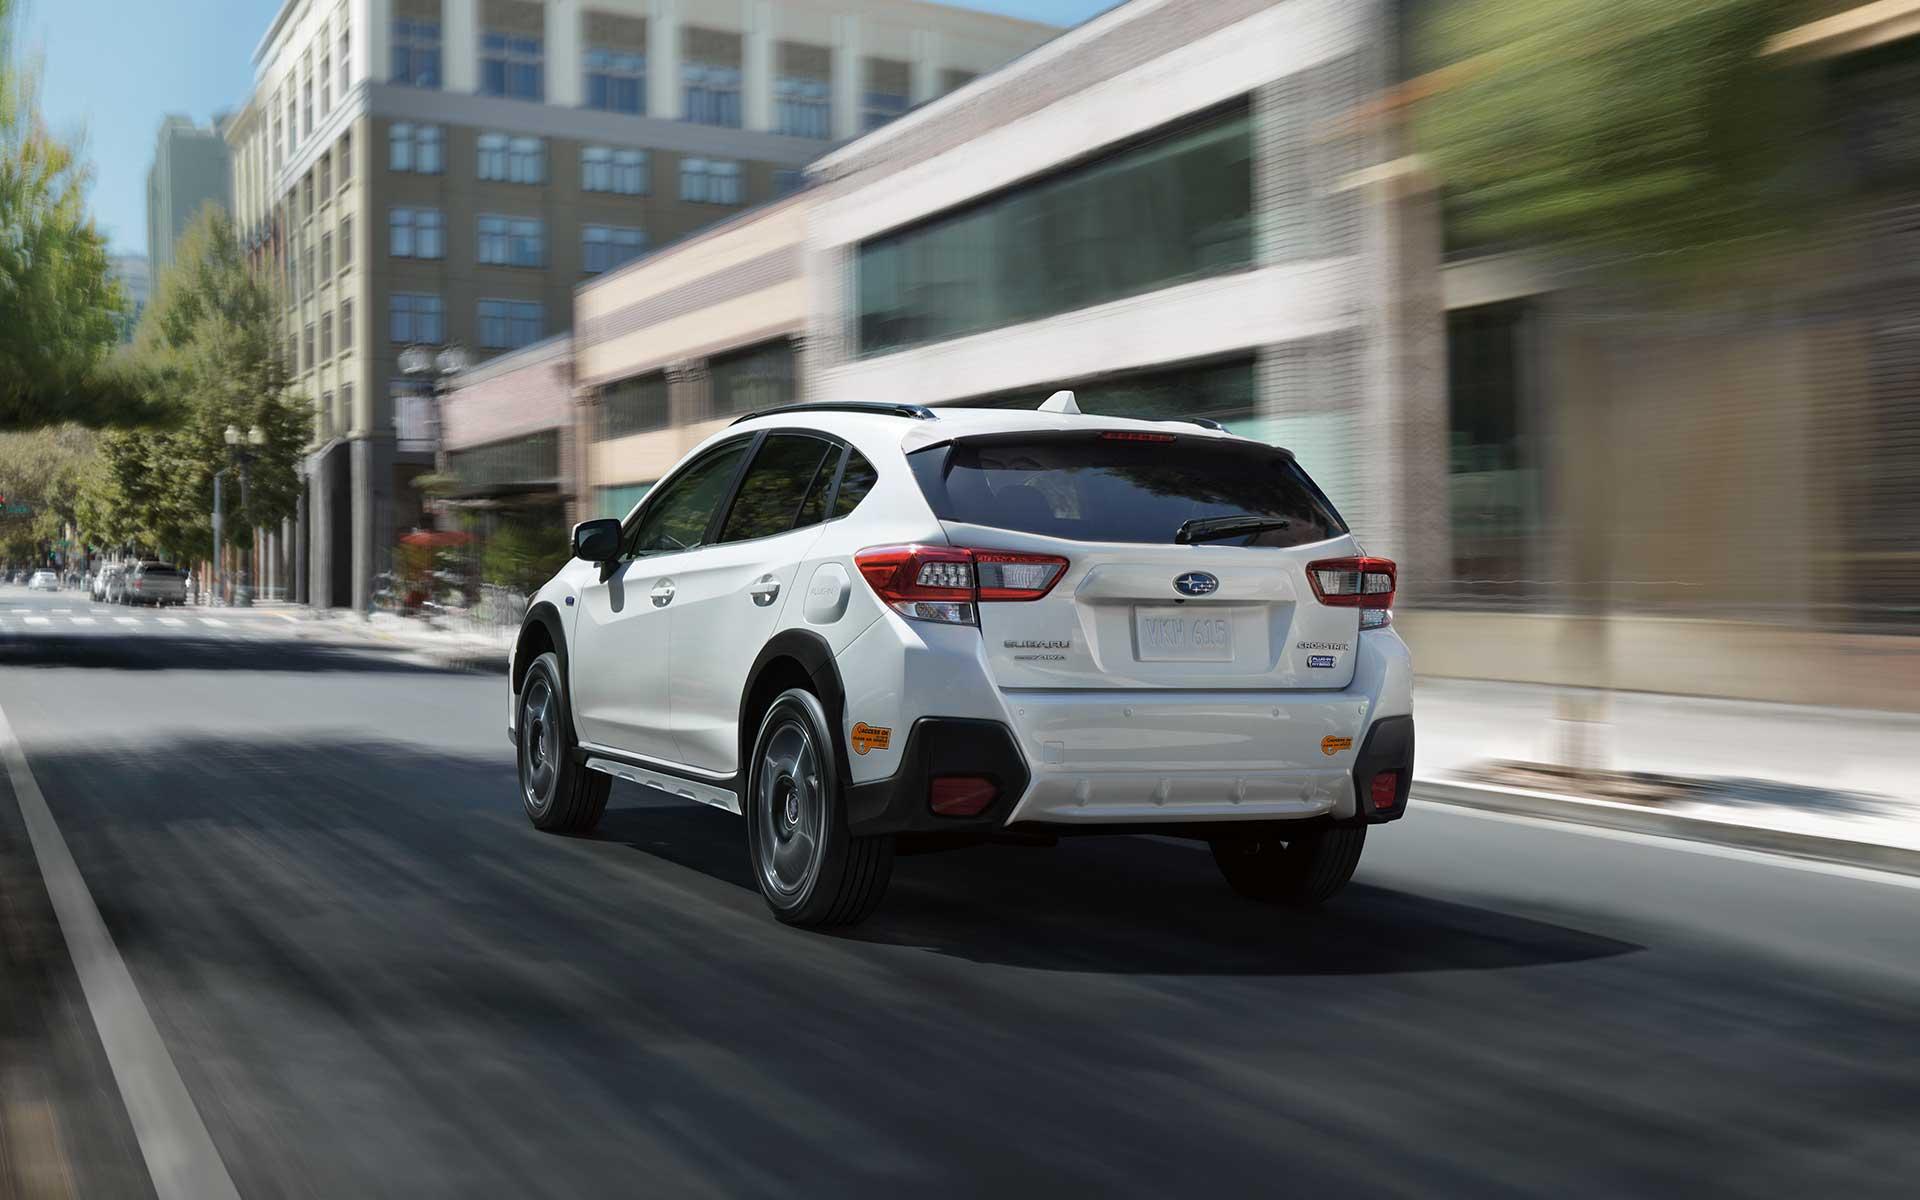 2021 Subaru Crosstrek Hybrid Bergen County NJ